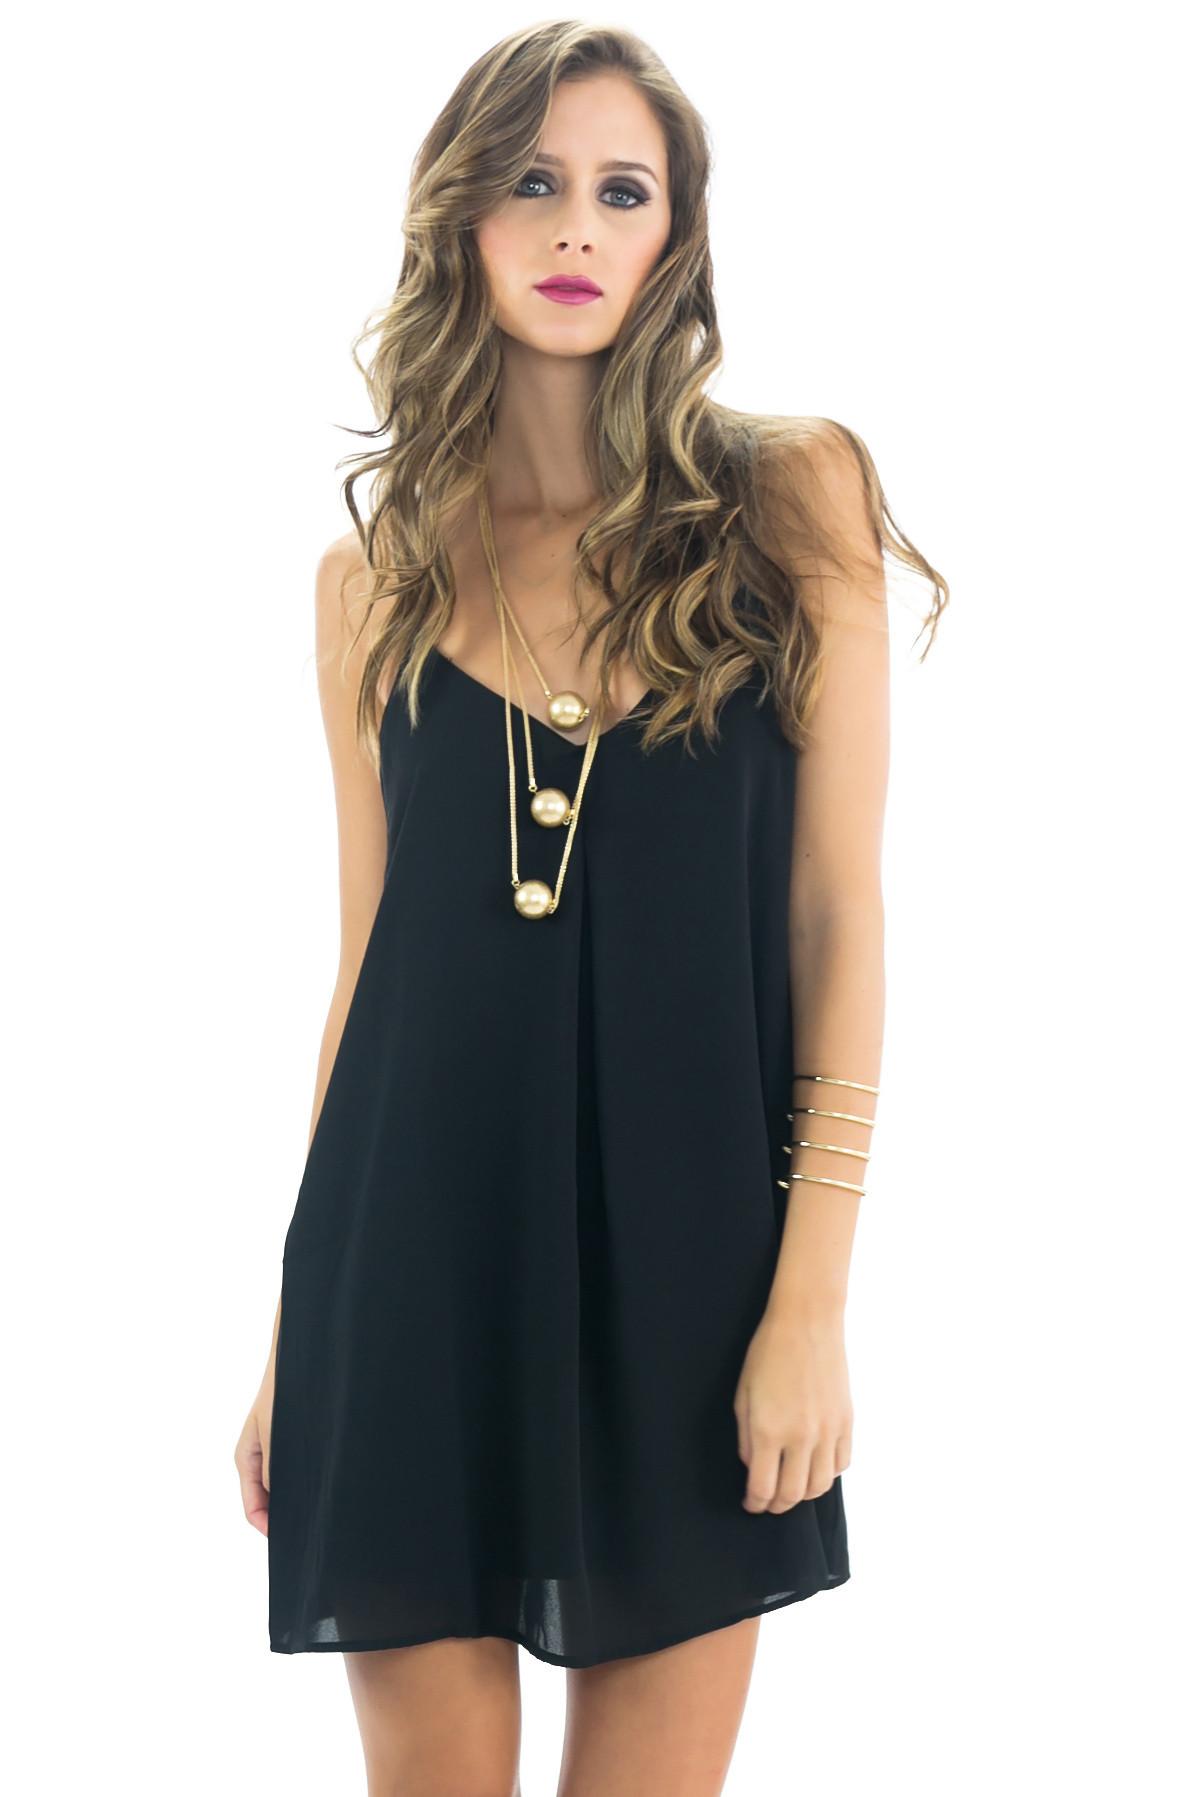 Gela spaghetti camisole dress